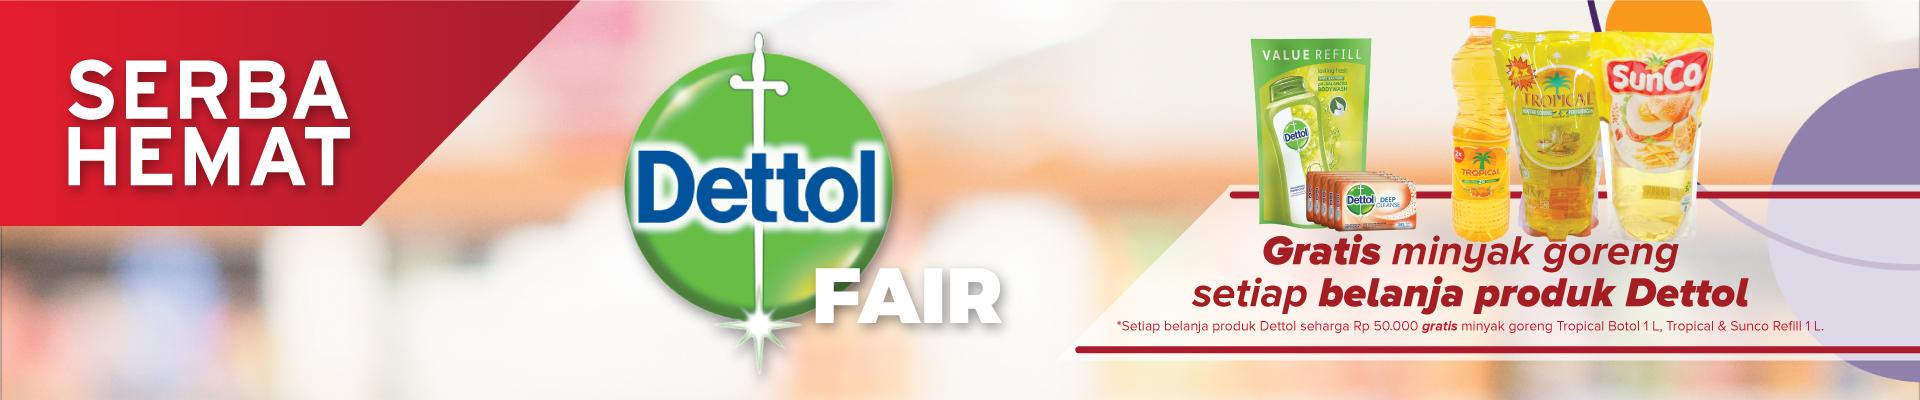 Dettol Fair